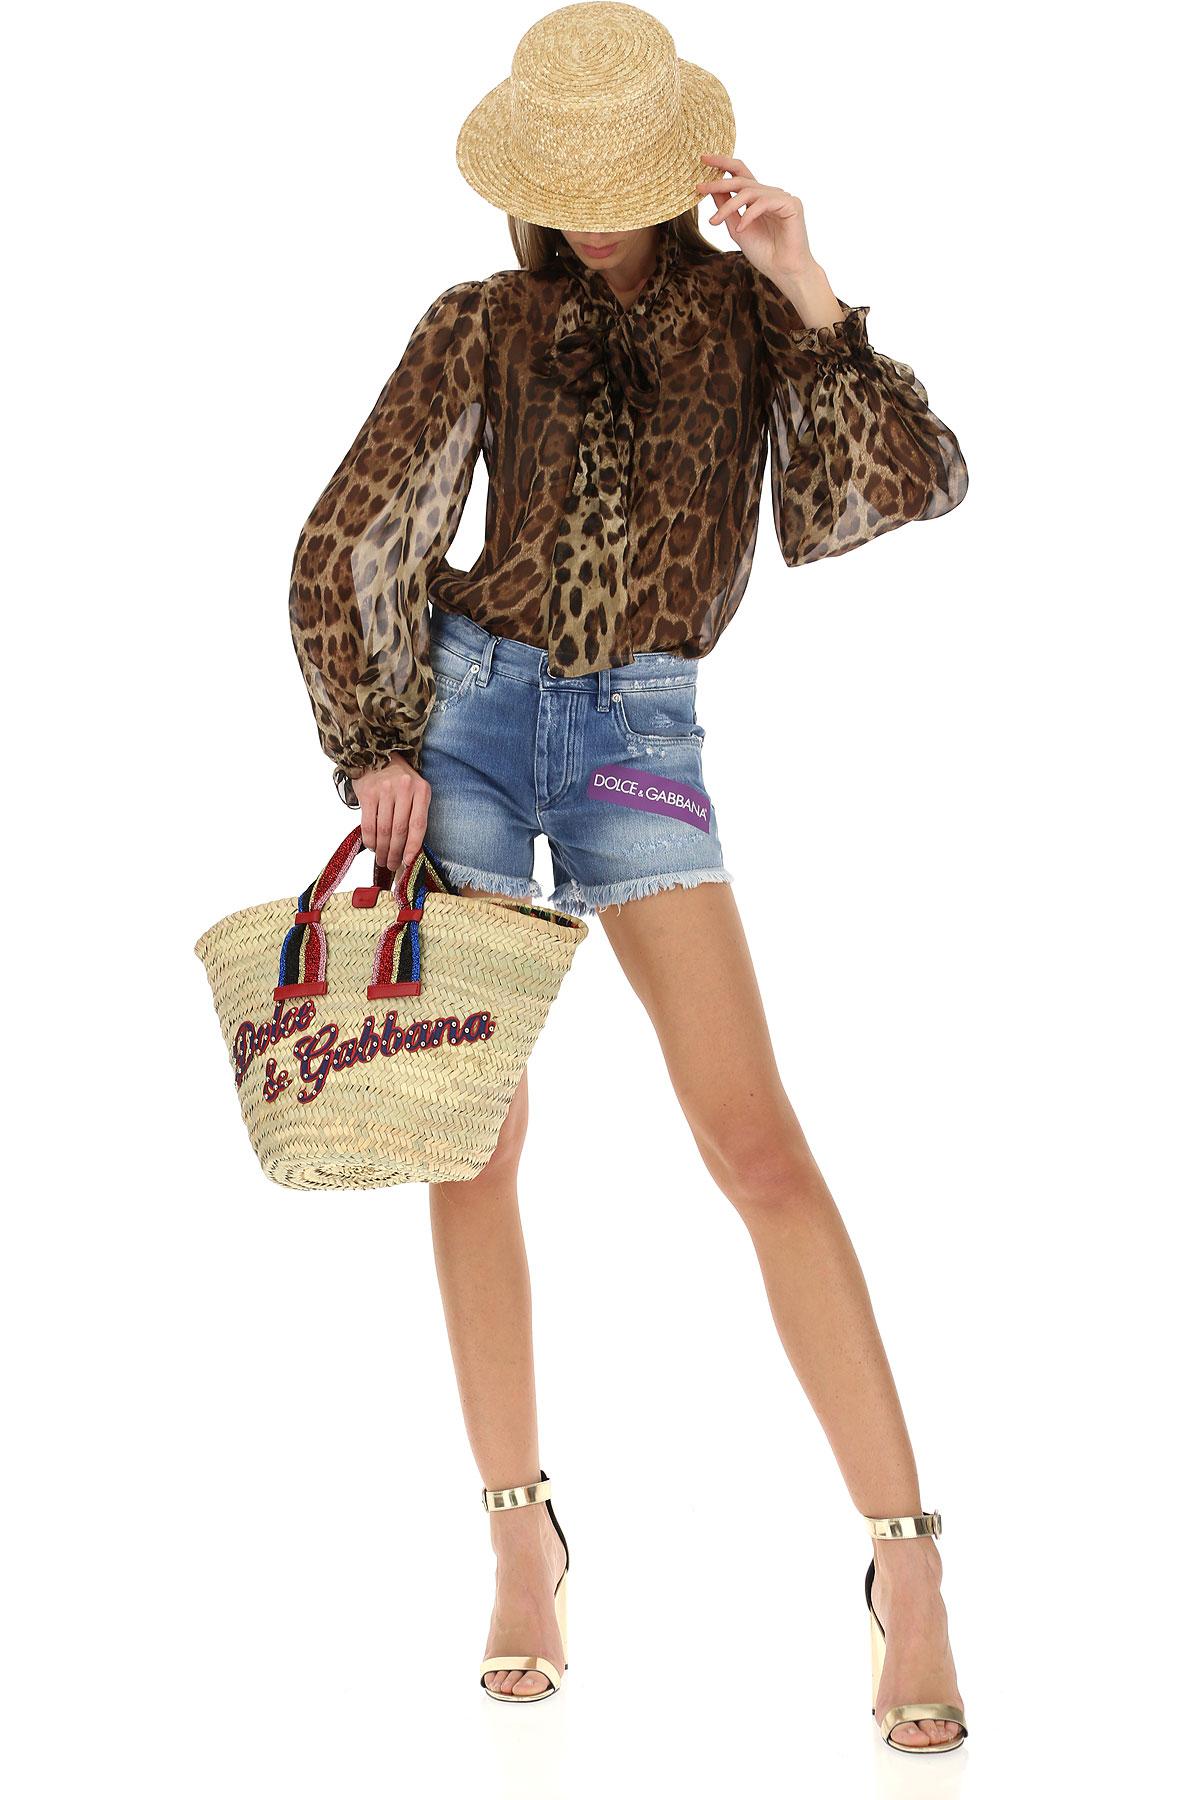 Primavera Dolce Para Gabbana nbsp; 2019 amp; Ropa verano Mujer Leopardo wX7wTqr